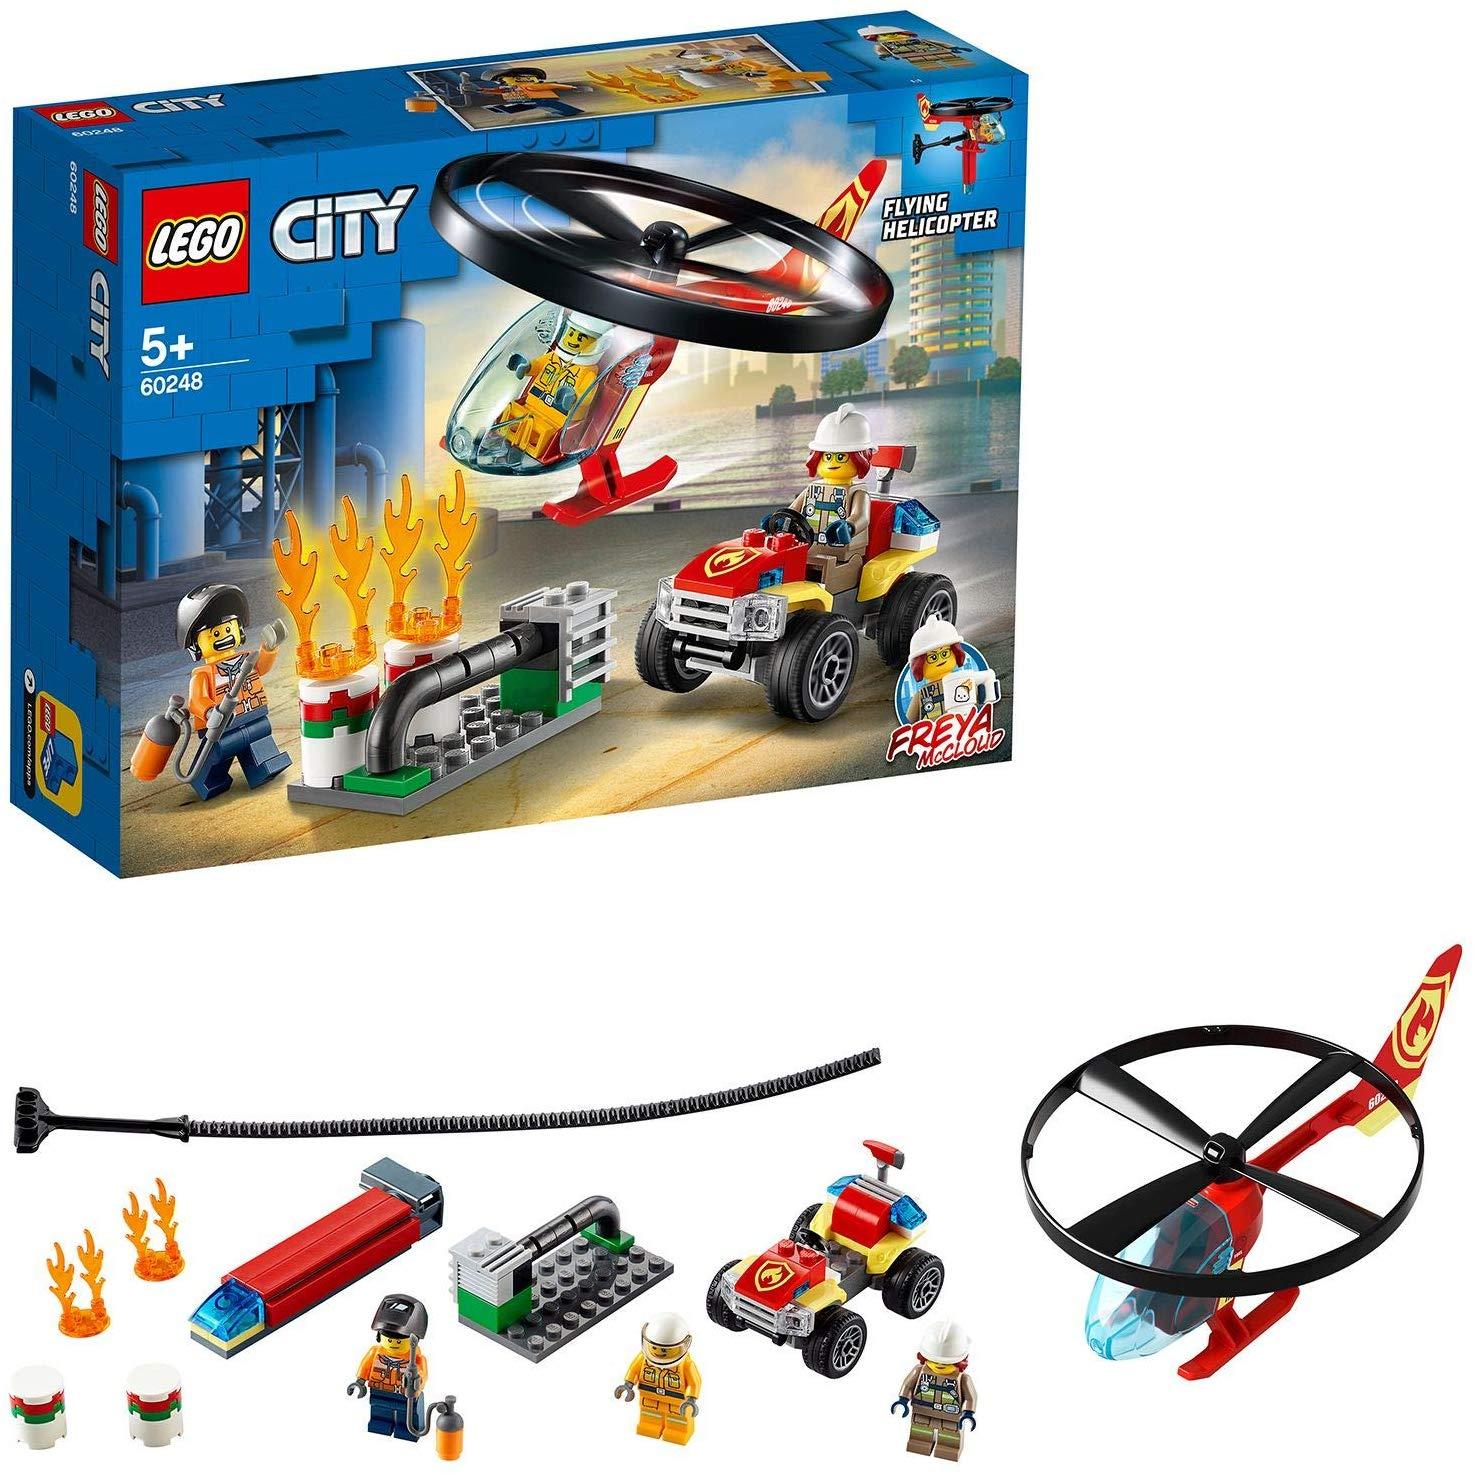 LEGO City 60248 Fire Helicopter Response £14 (Prime) + £4.49 (non Prime) at Amazon